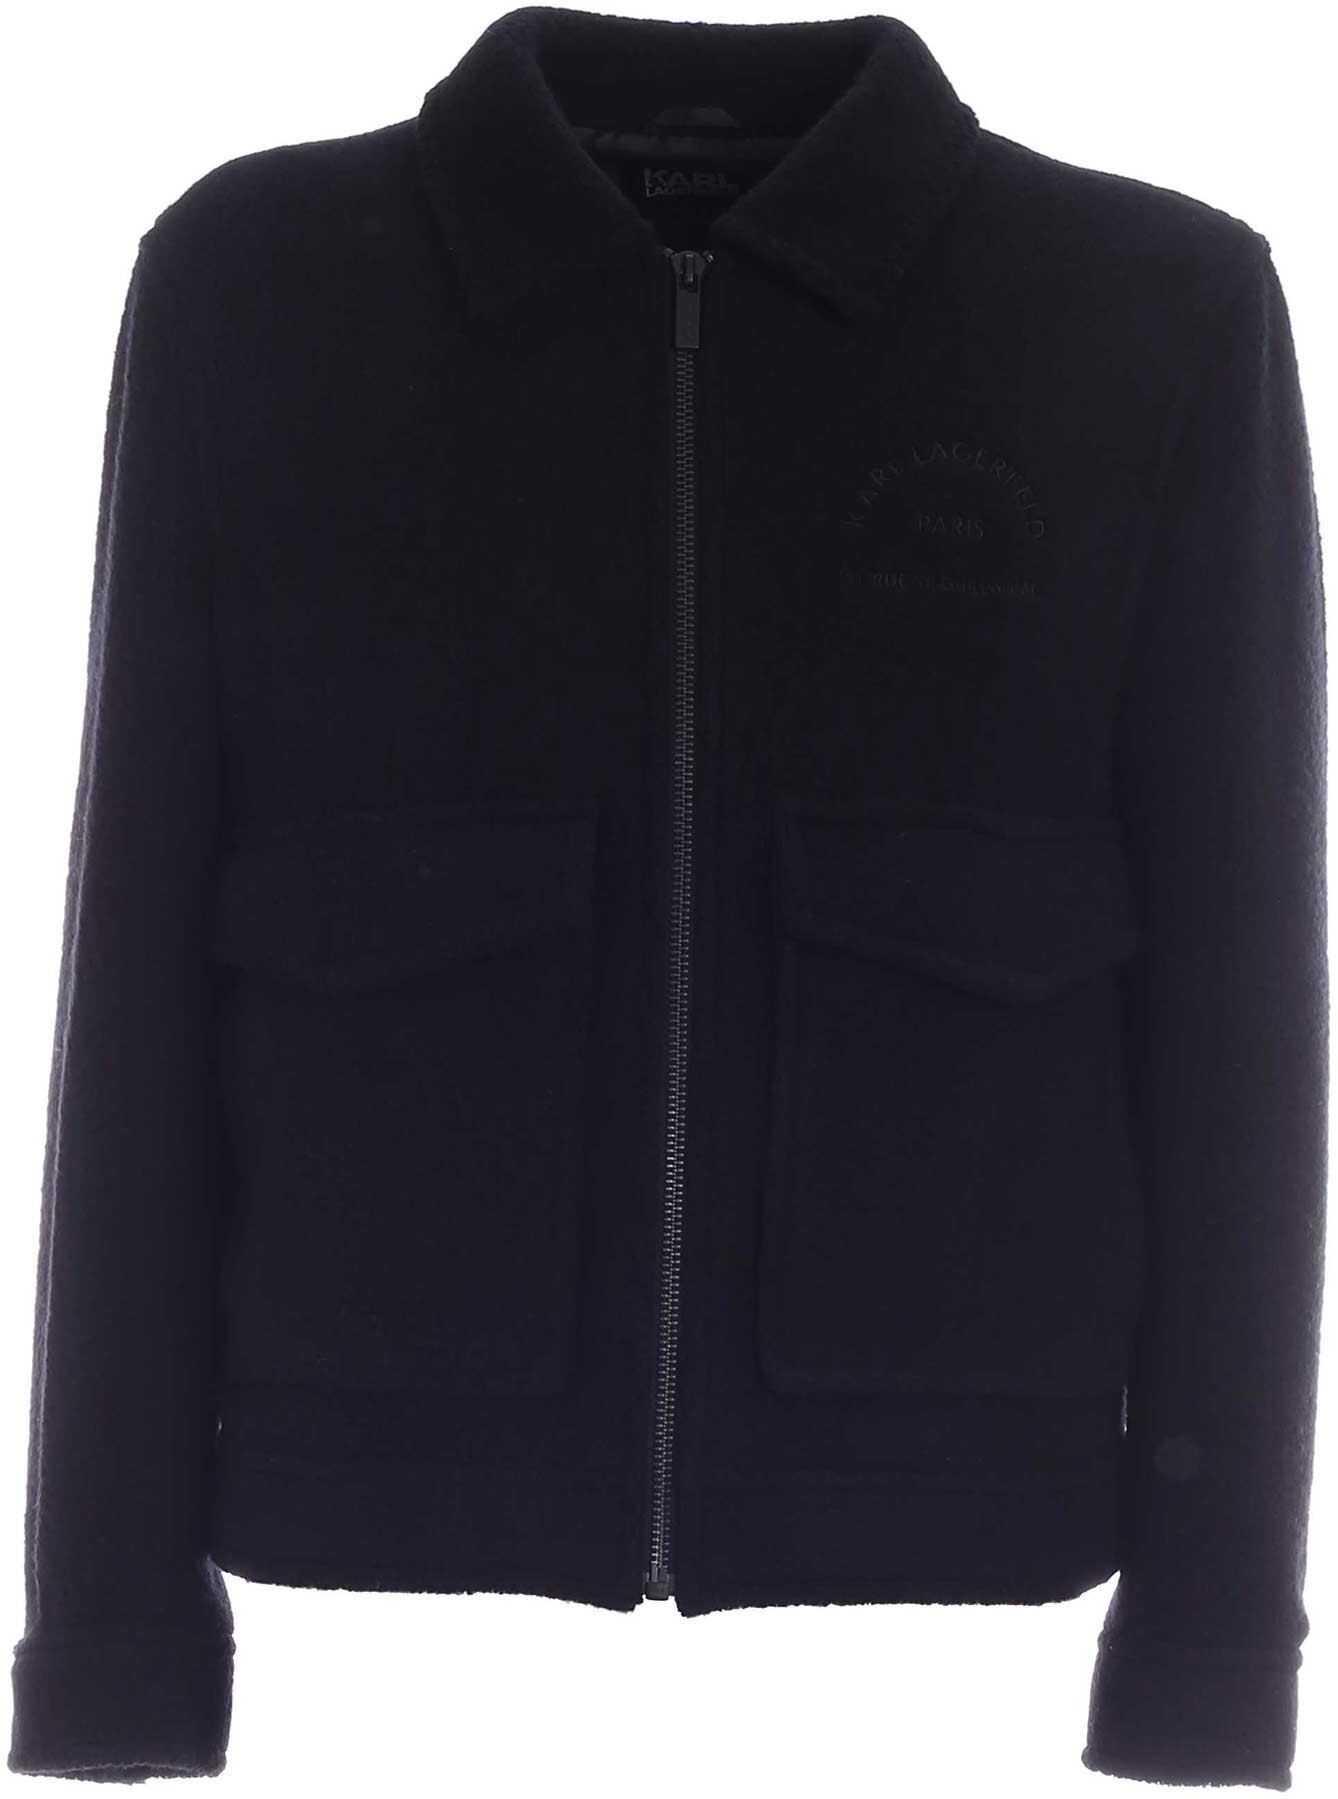 Karl Lagerfeld Logo Embroidery Wool Jacket In Black Black imagine